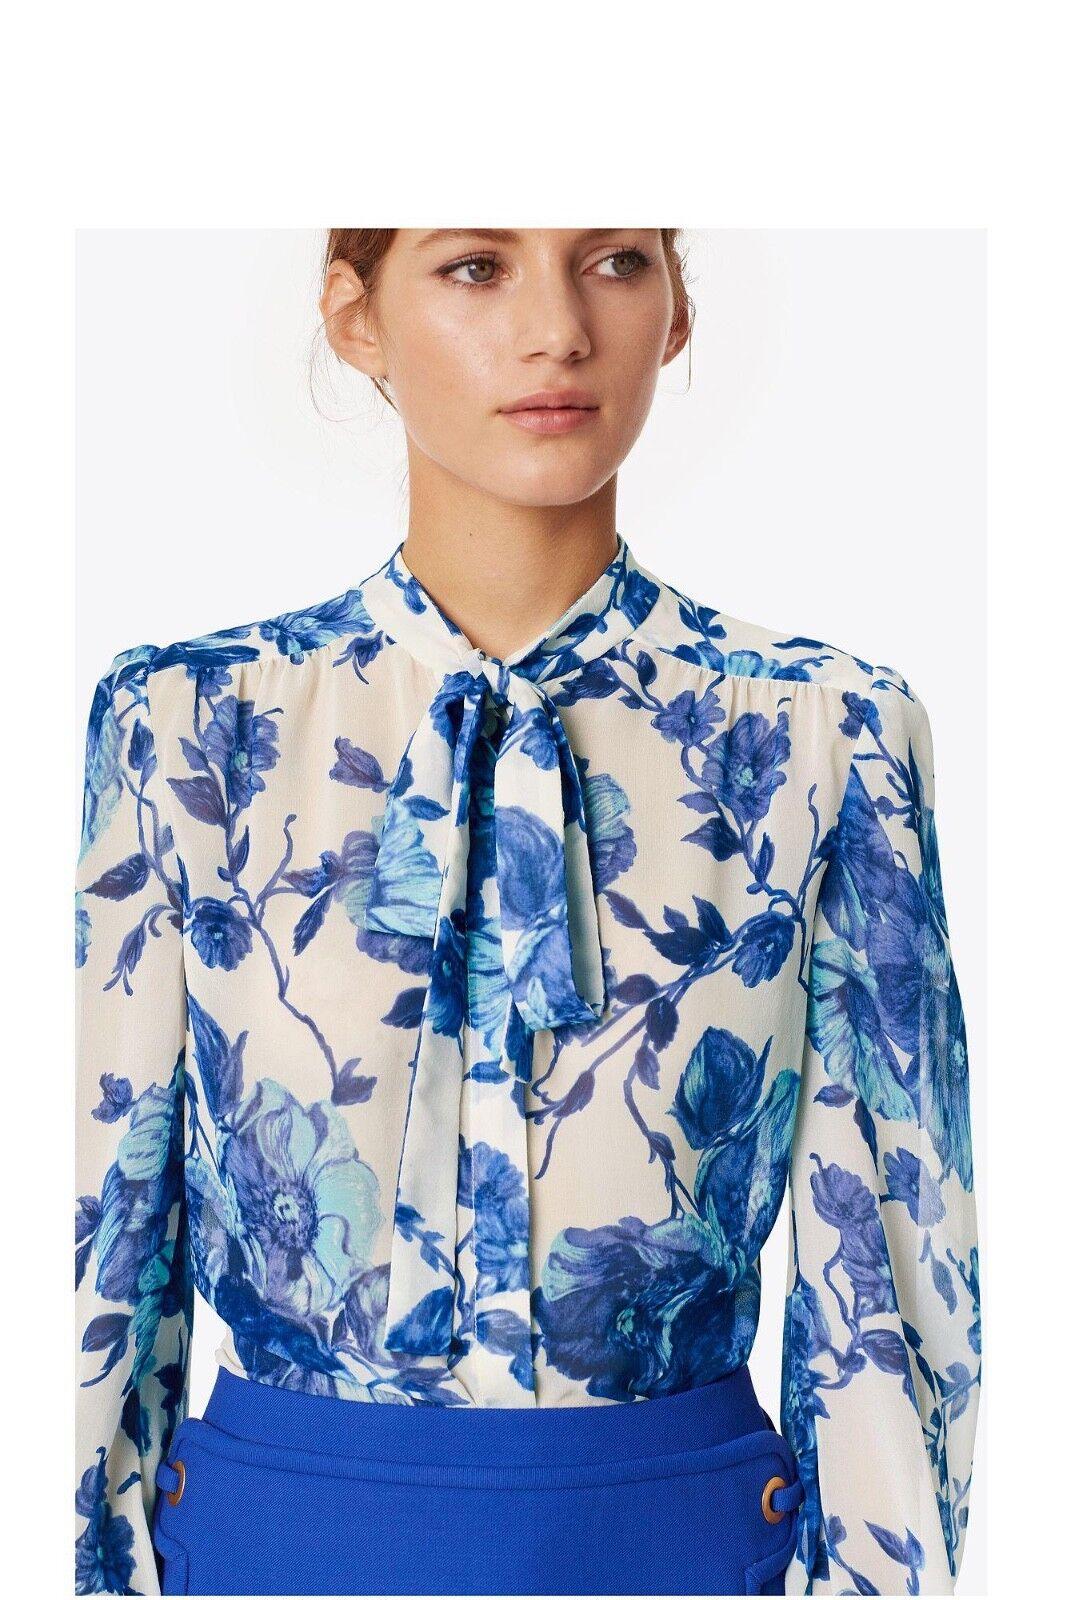 Tory Burch 12 Kia Bow Blouse Shirt M L Rosamont Floral Fall 2017 Garden Party XL